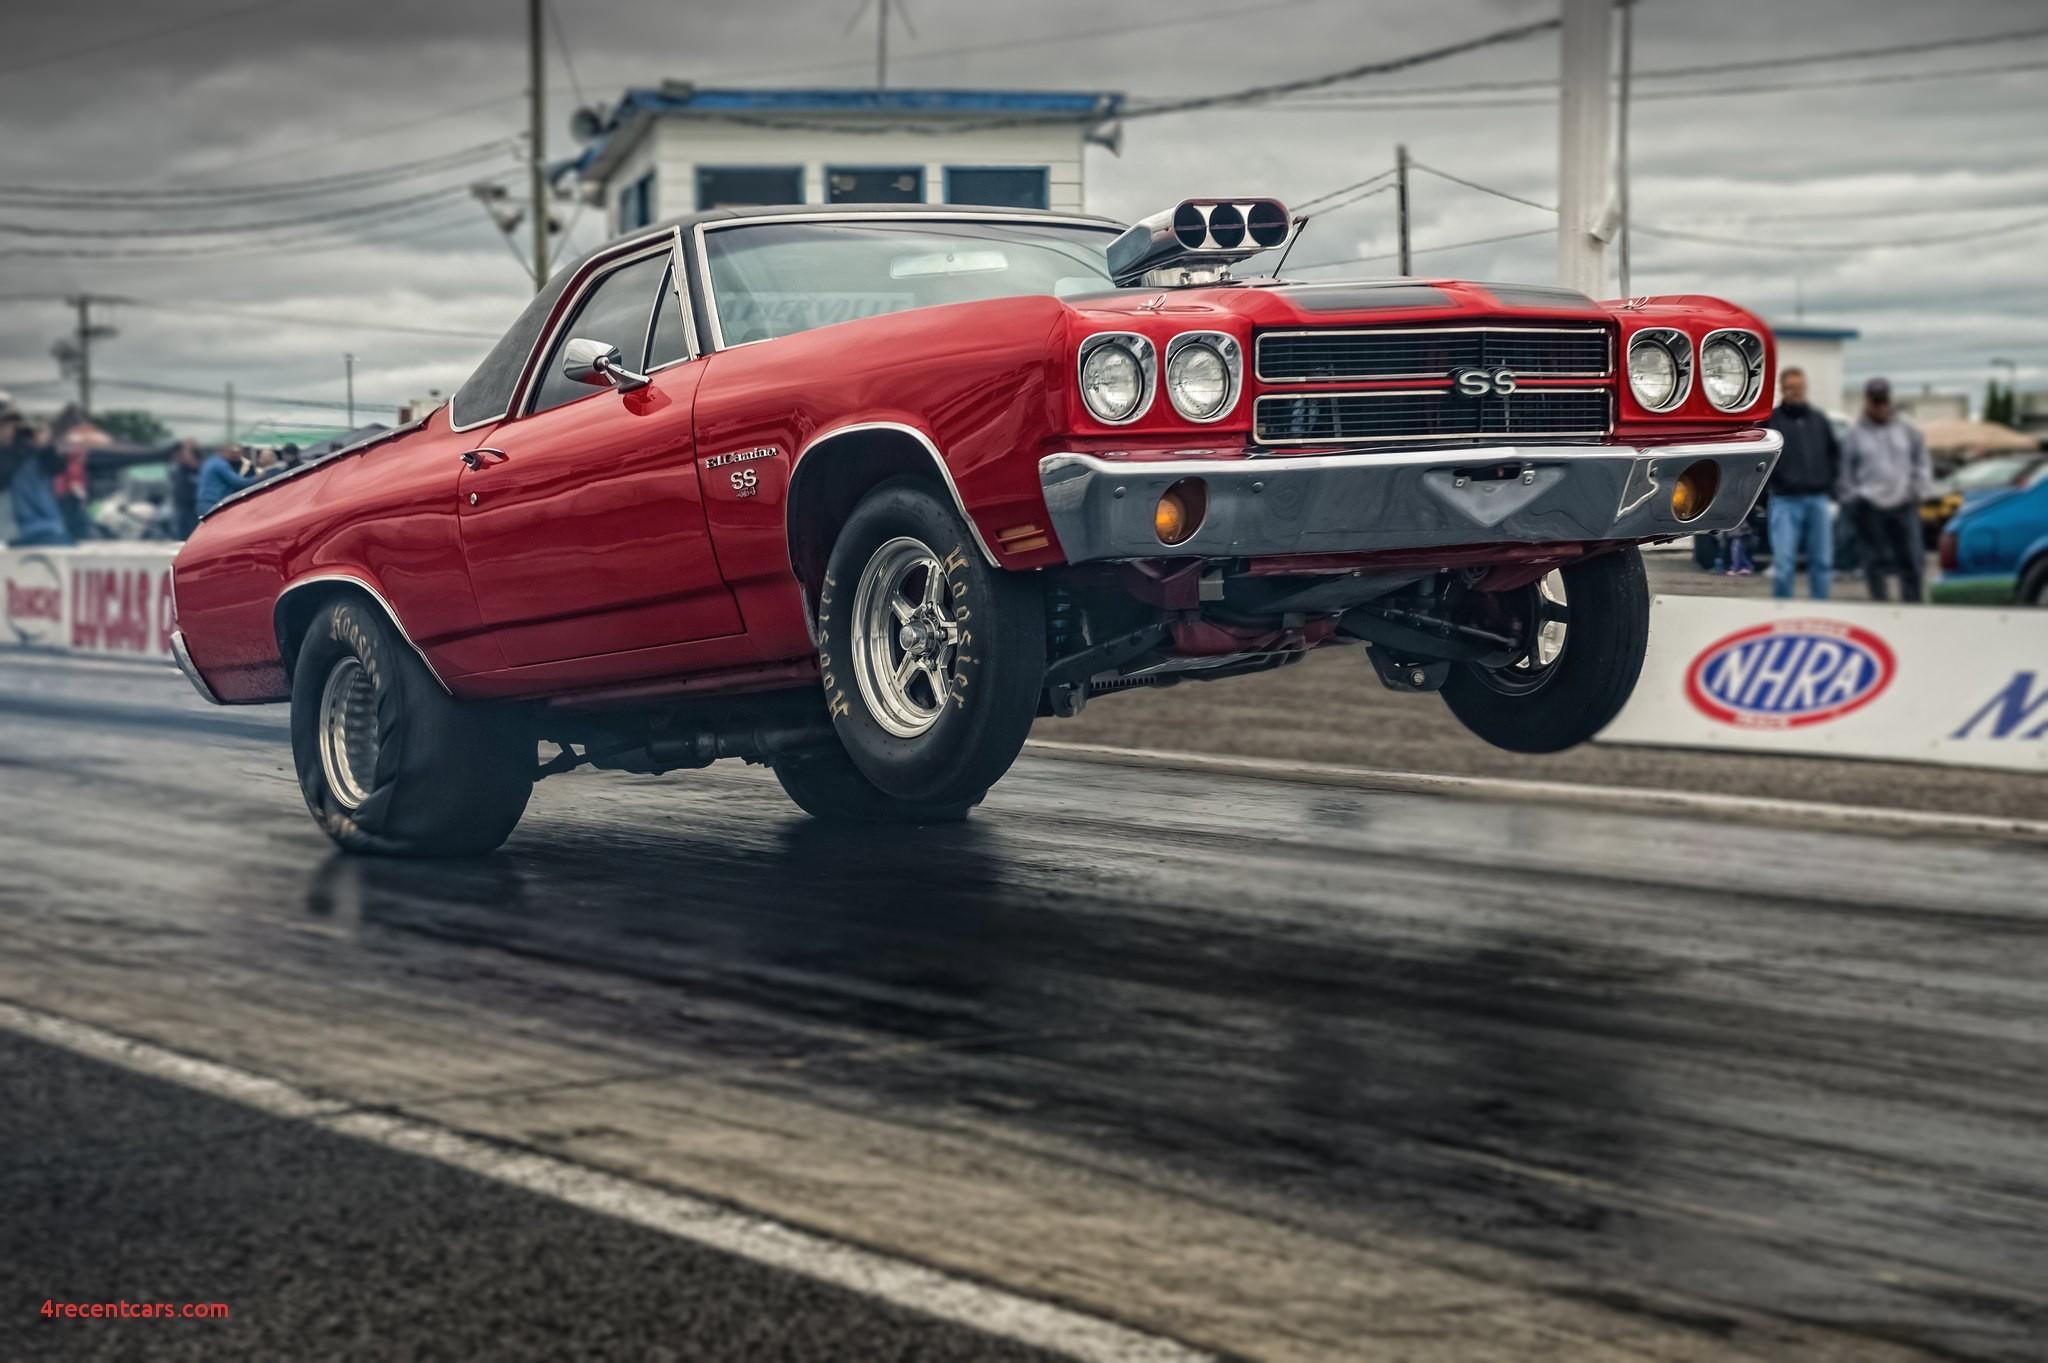 Res: 2048x1363, Drag Racing Wallpapers 6 - 2048 X 1363